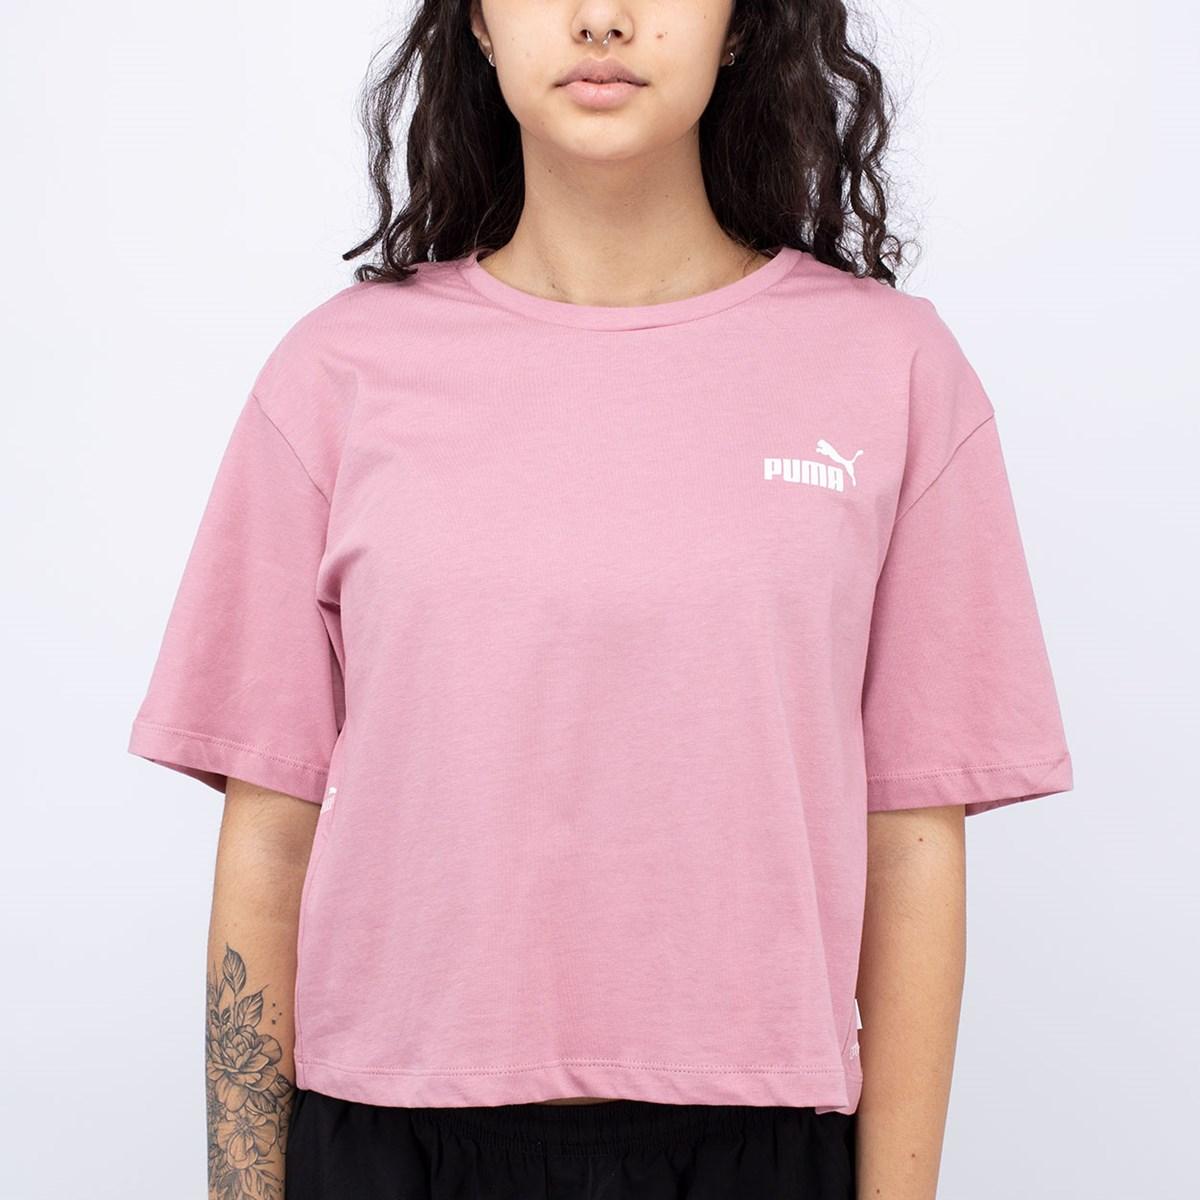 Camiseta Puma Amplified Foxglove 583609-16